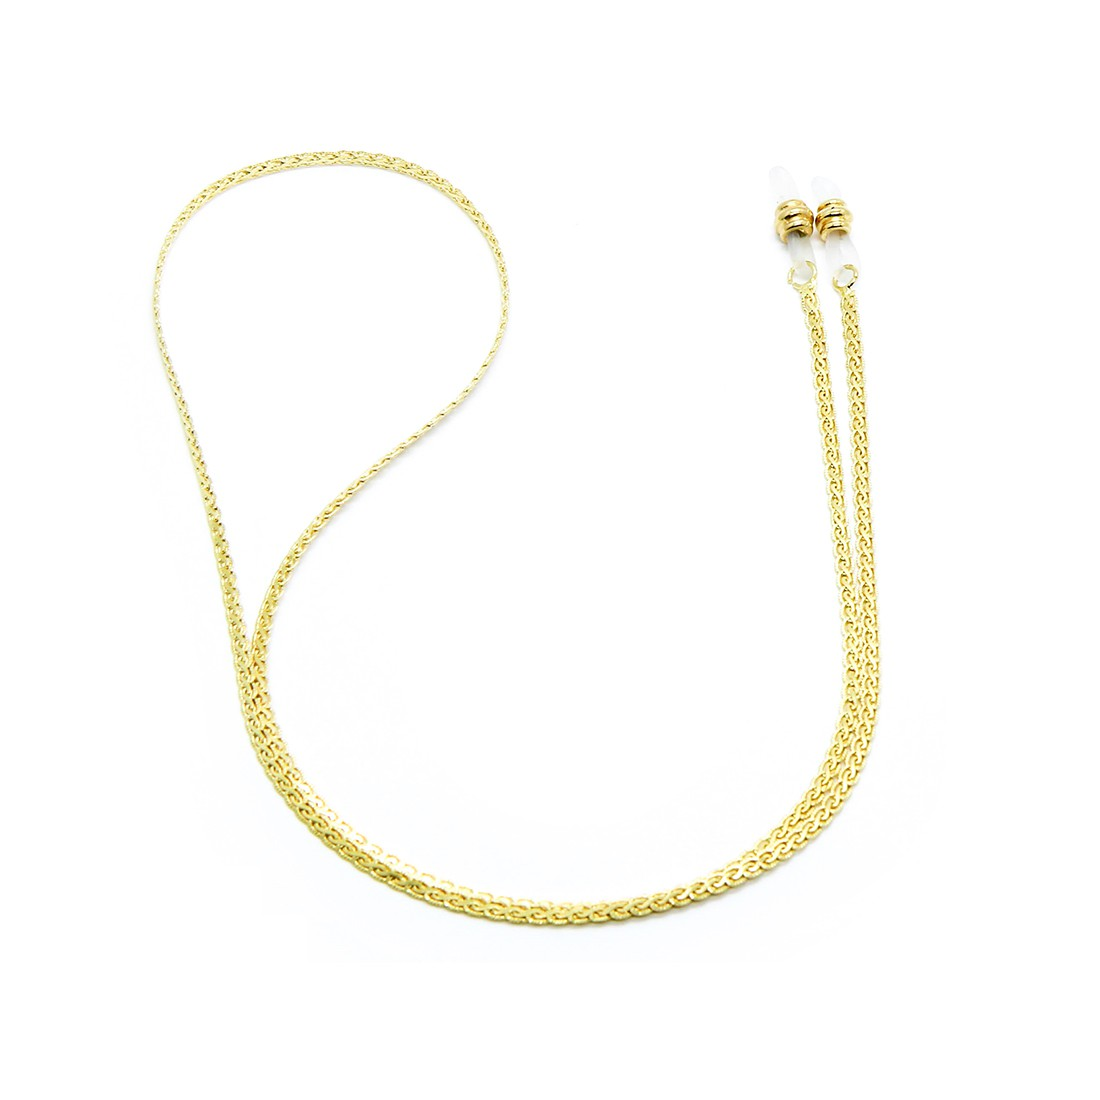 Corrente Especial L3333 62cm Cor Ouro